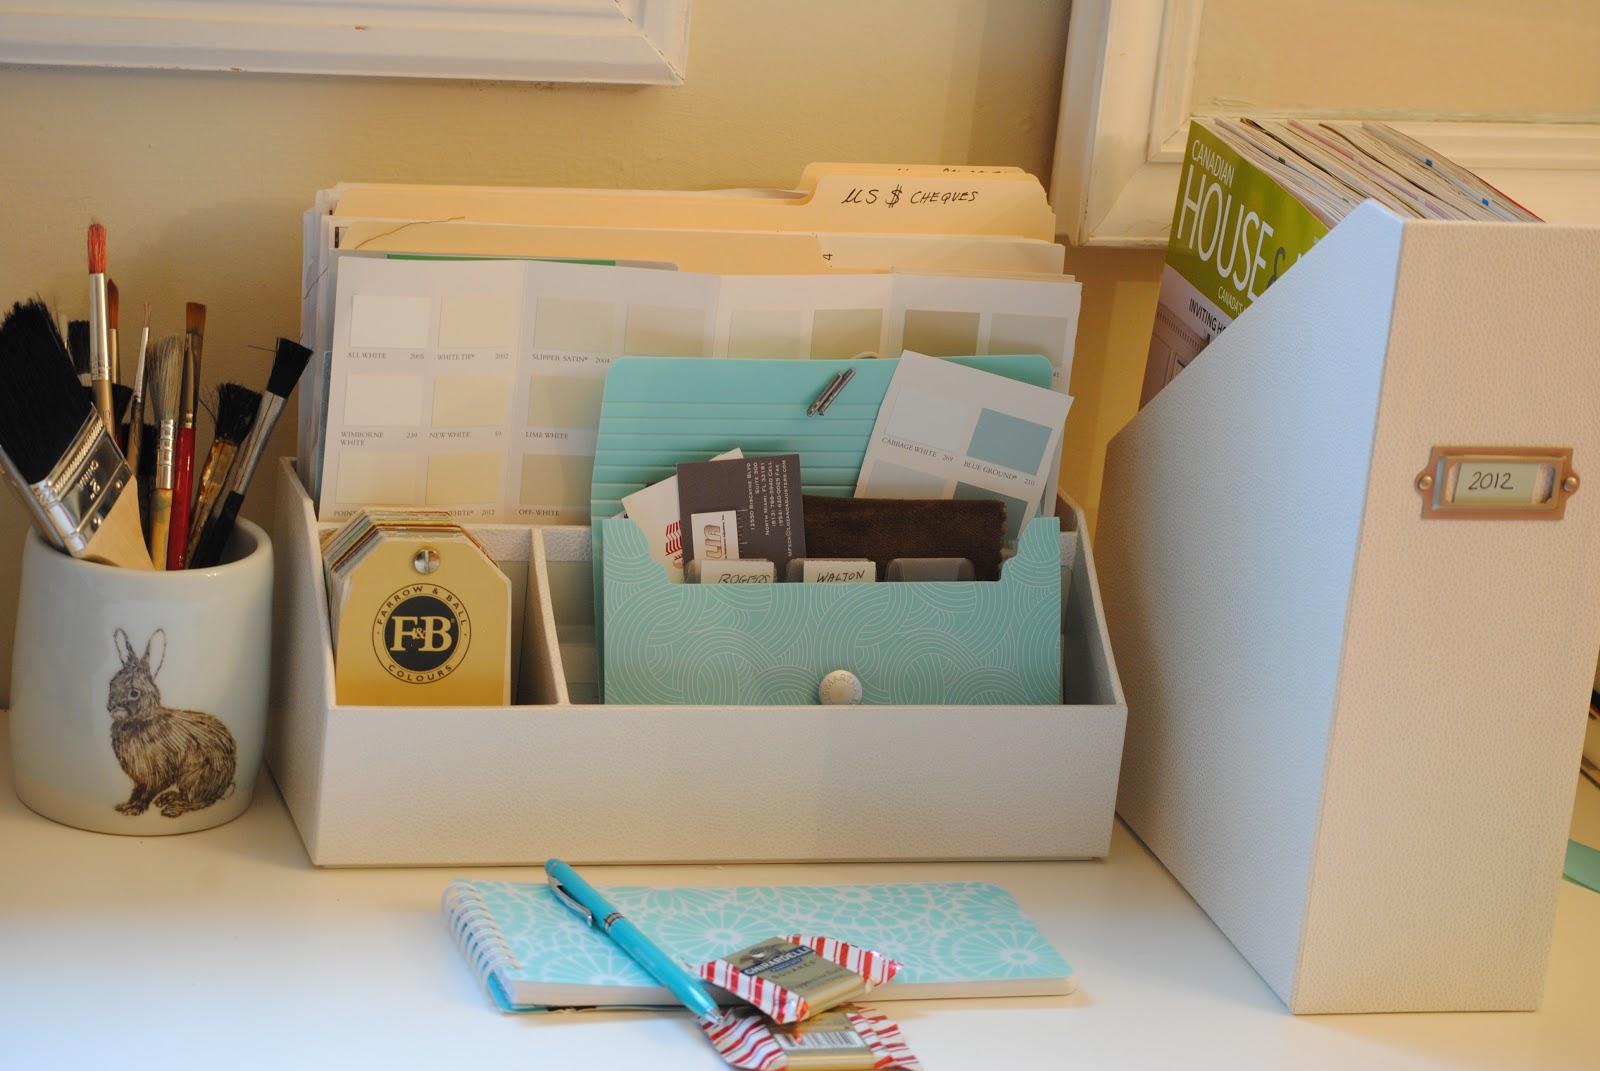 RAZMATAZ: Martha Stewart Home Office Supplies